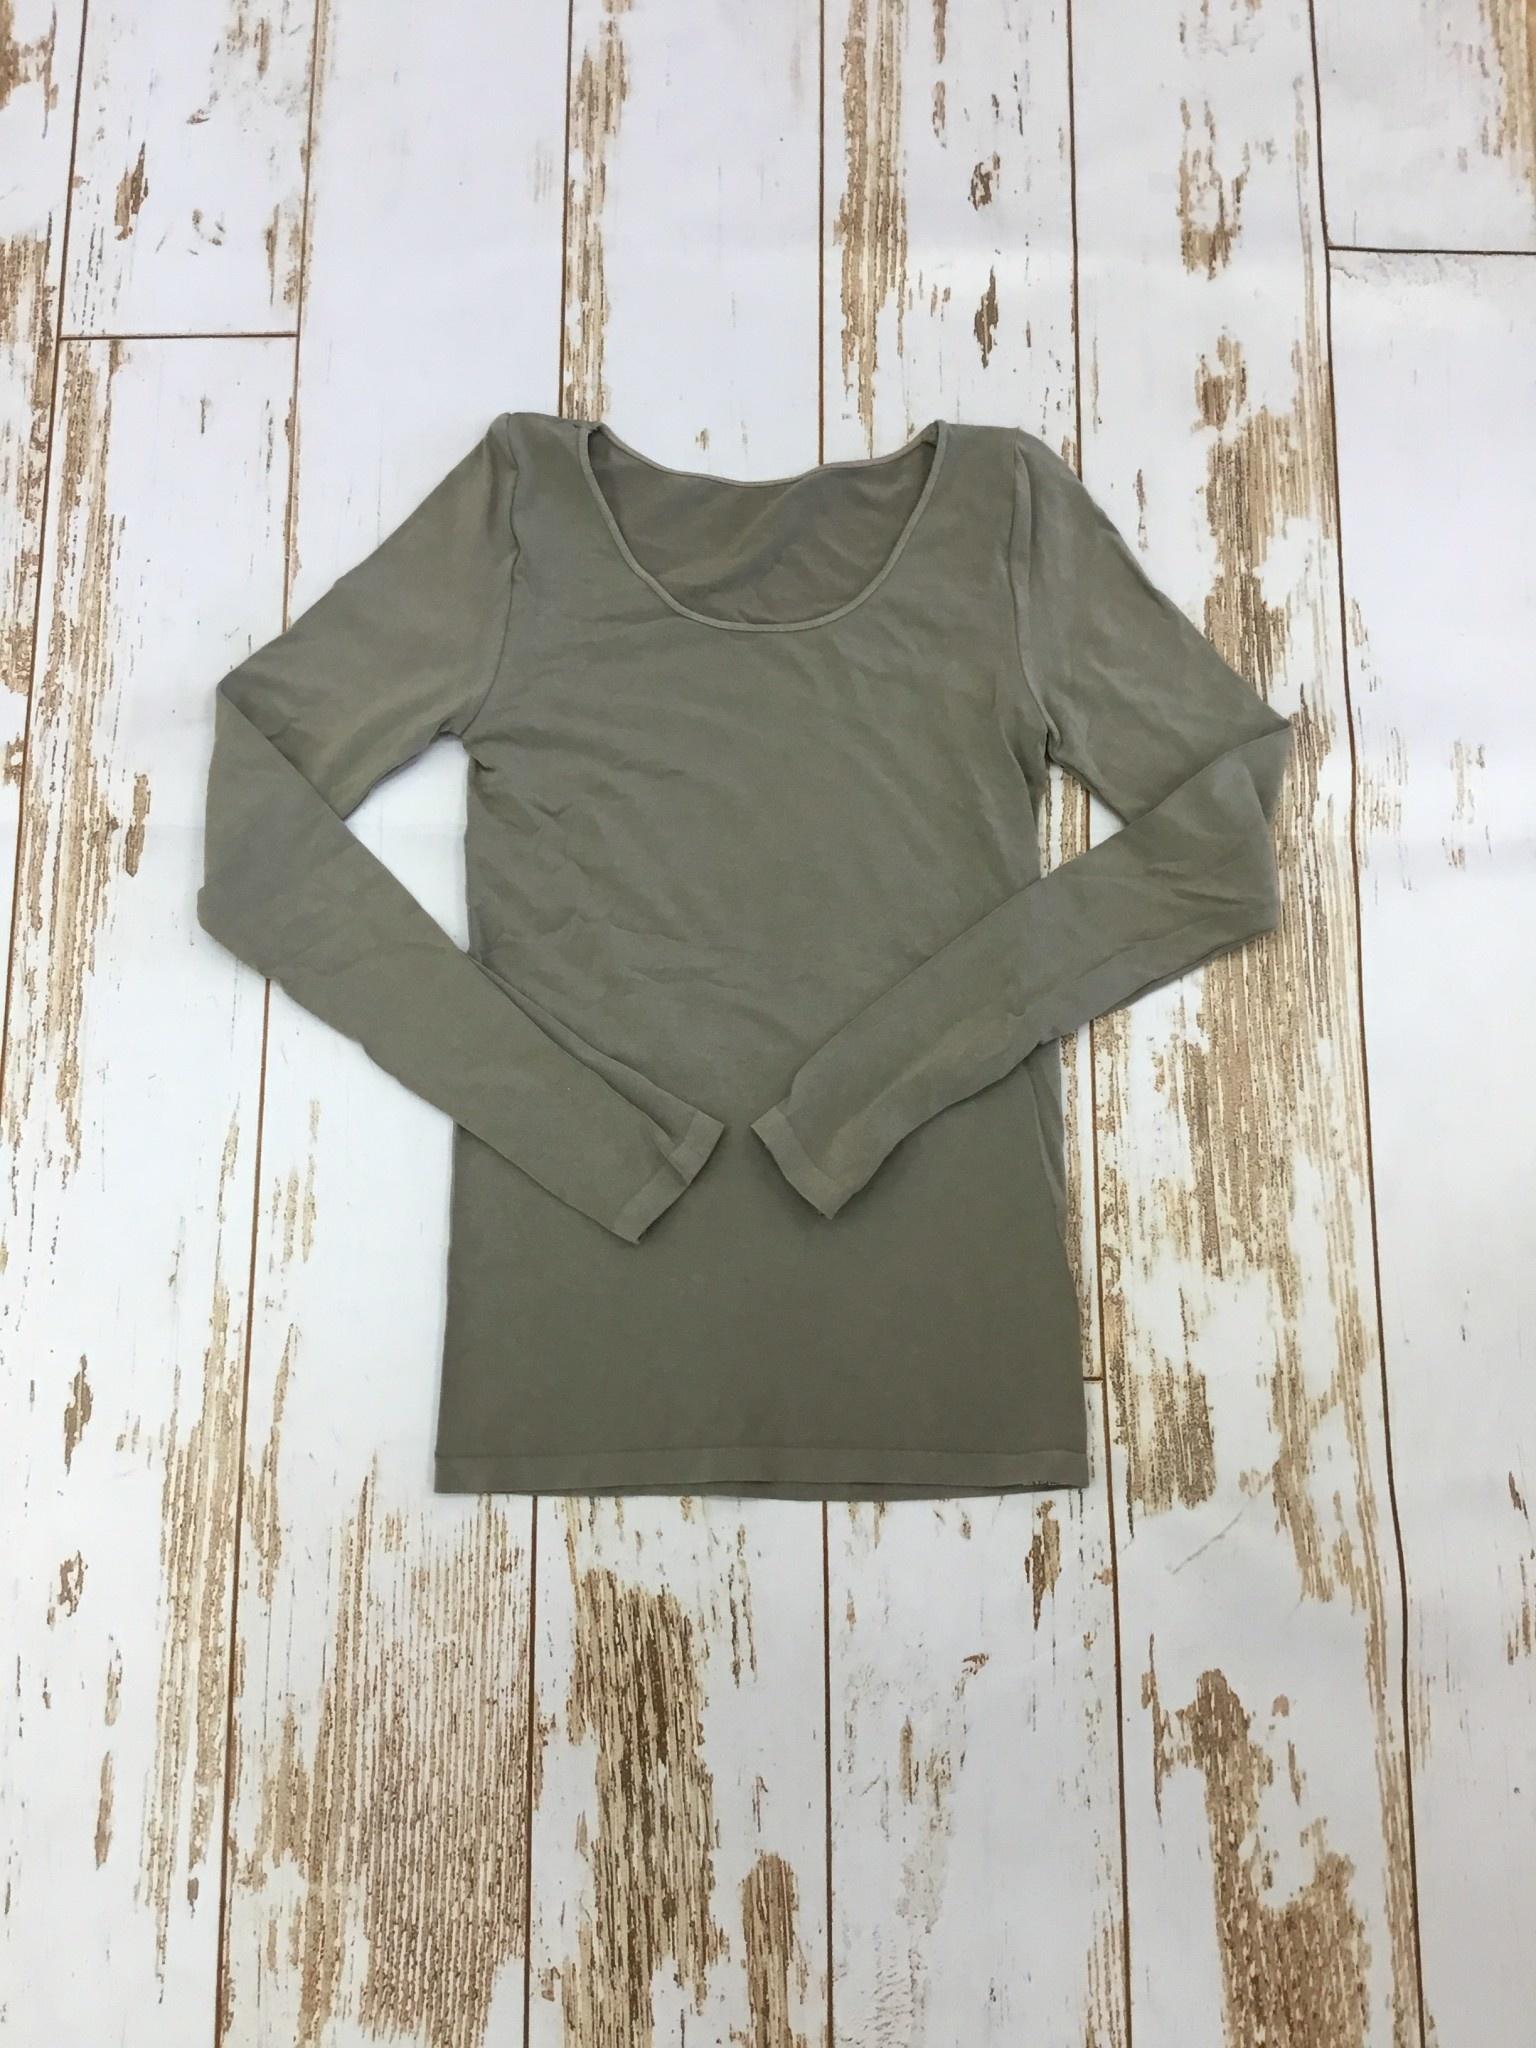 M.Rena Long Sleeve Top w/ Thumbhole in Sandstone